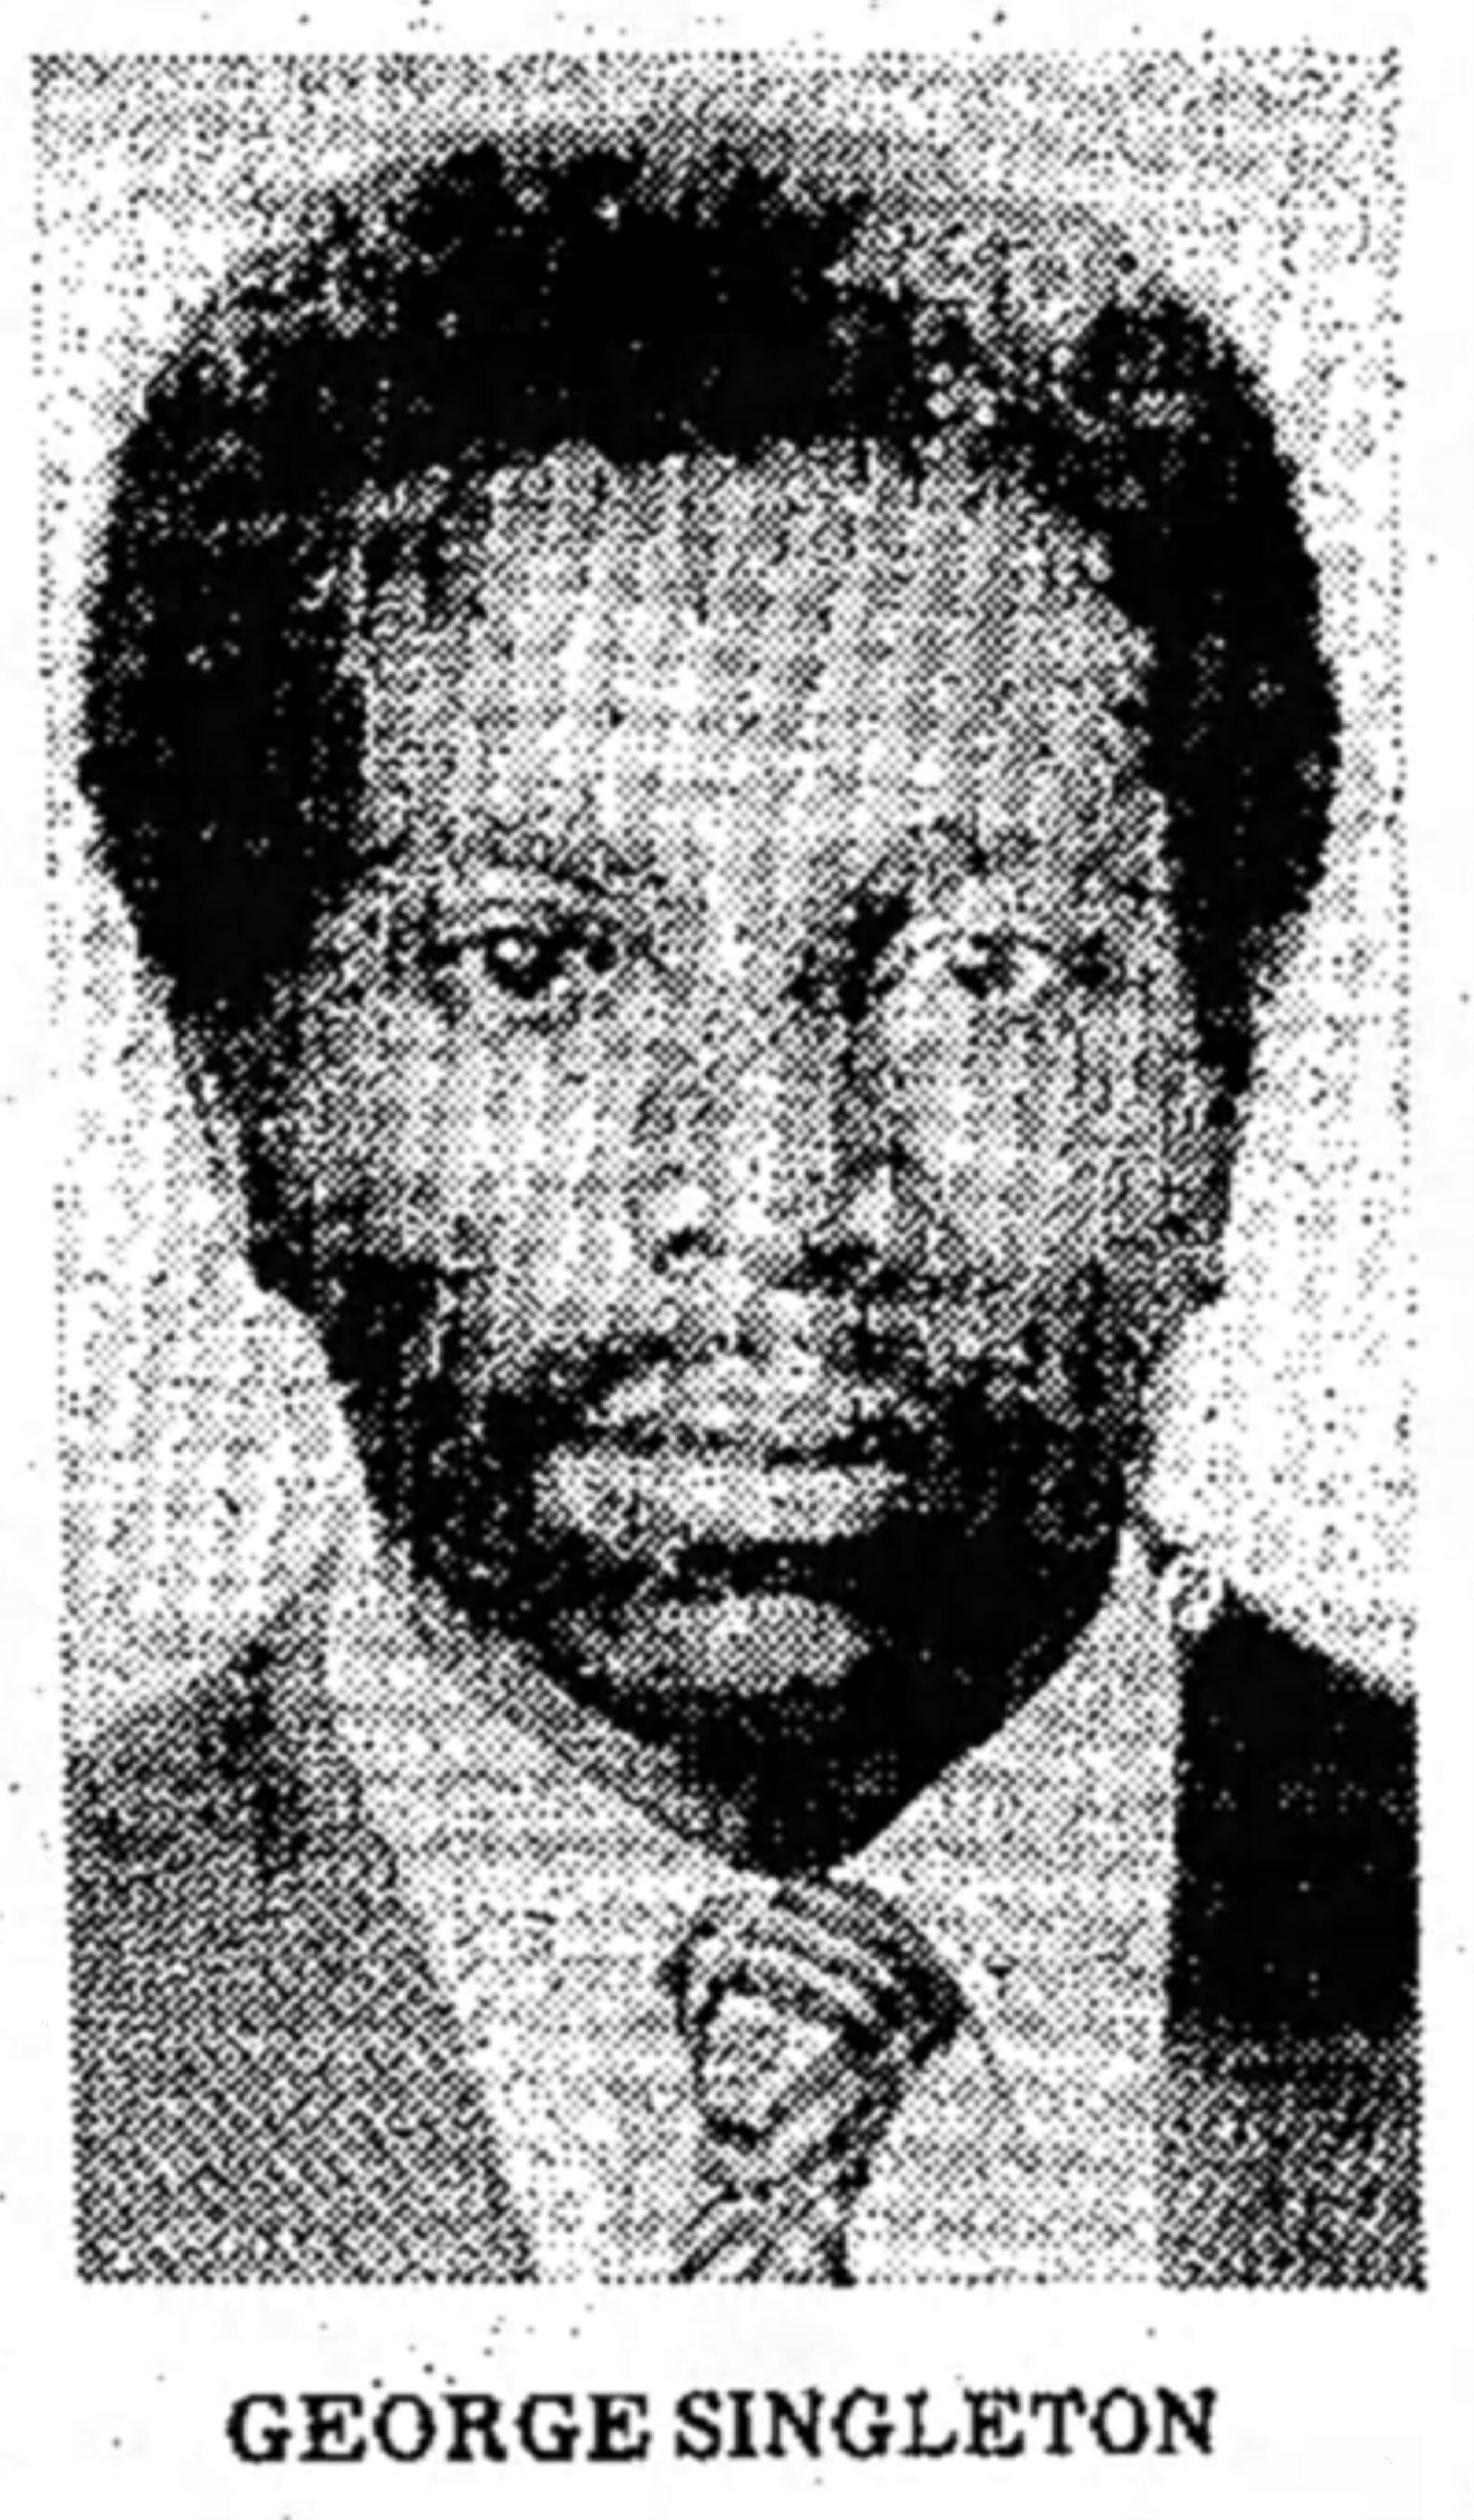 Customs Patrolman George William Singleton | United States Department of the Treasury - Customs Service, U.S. Government